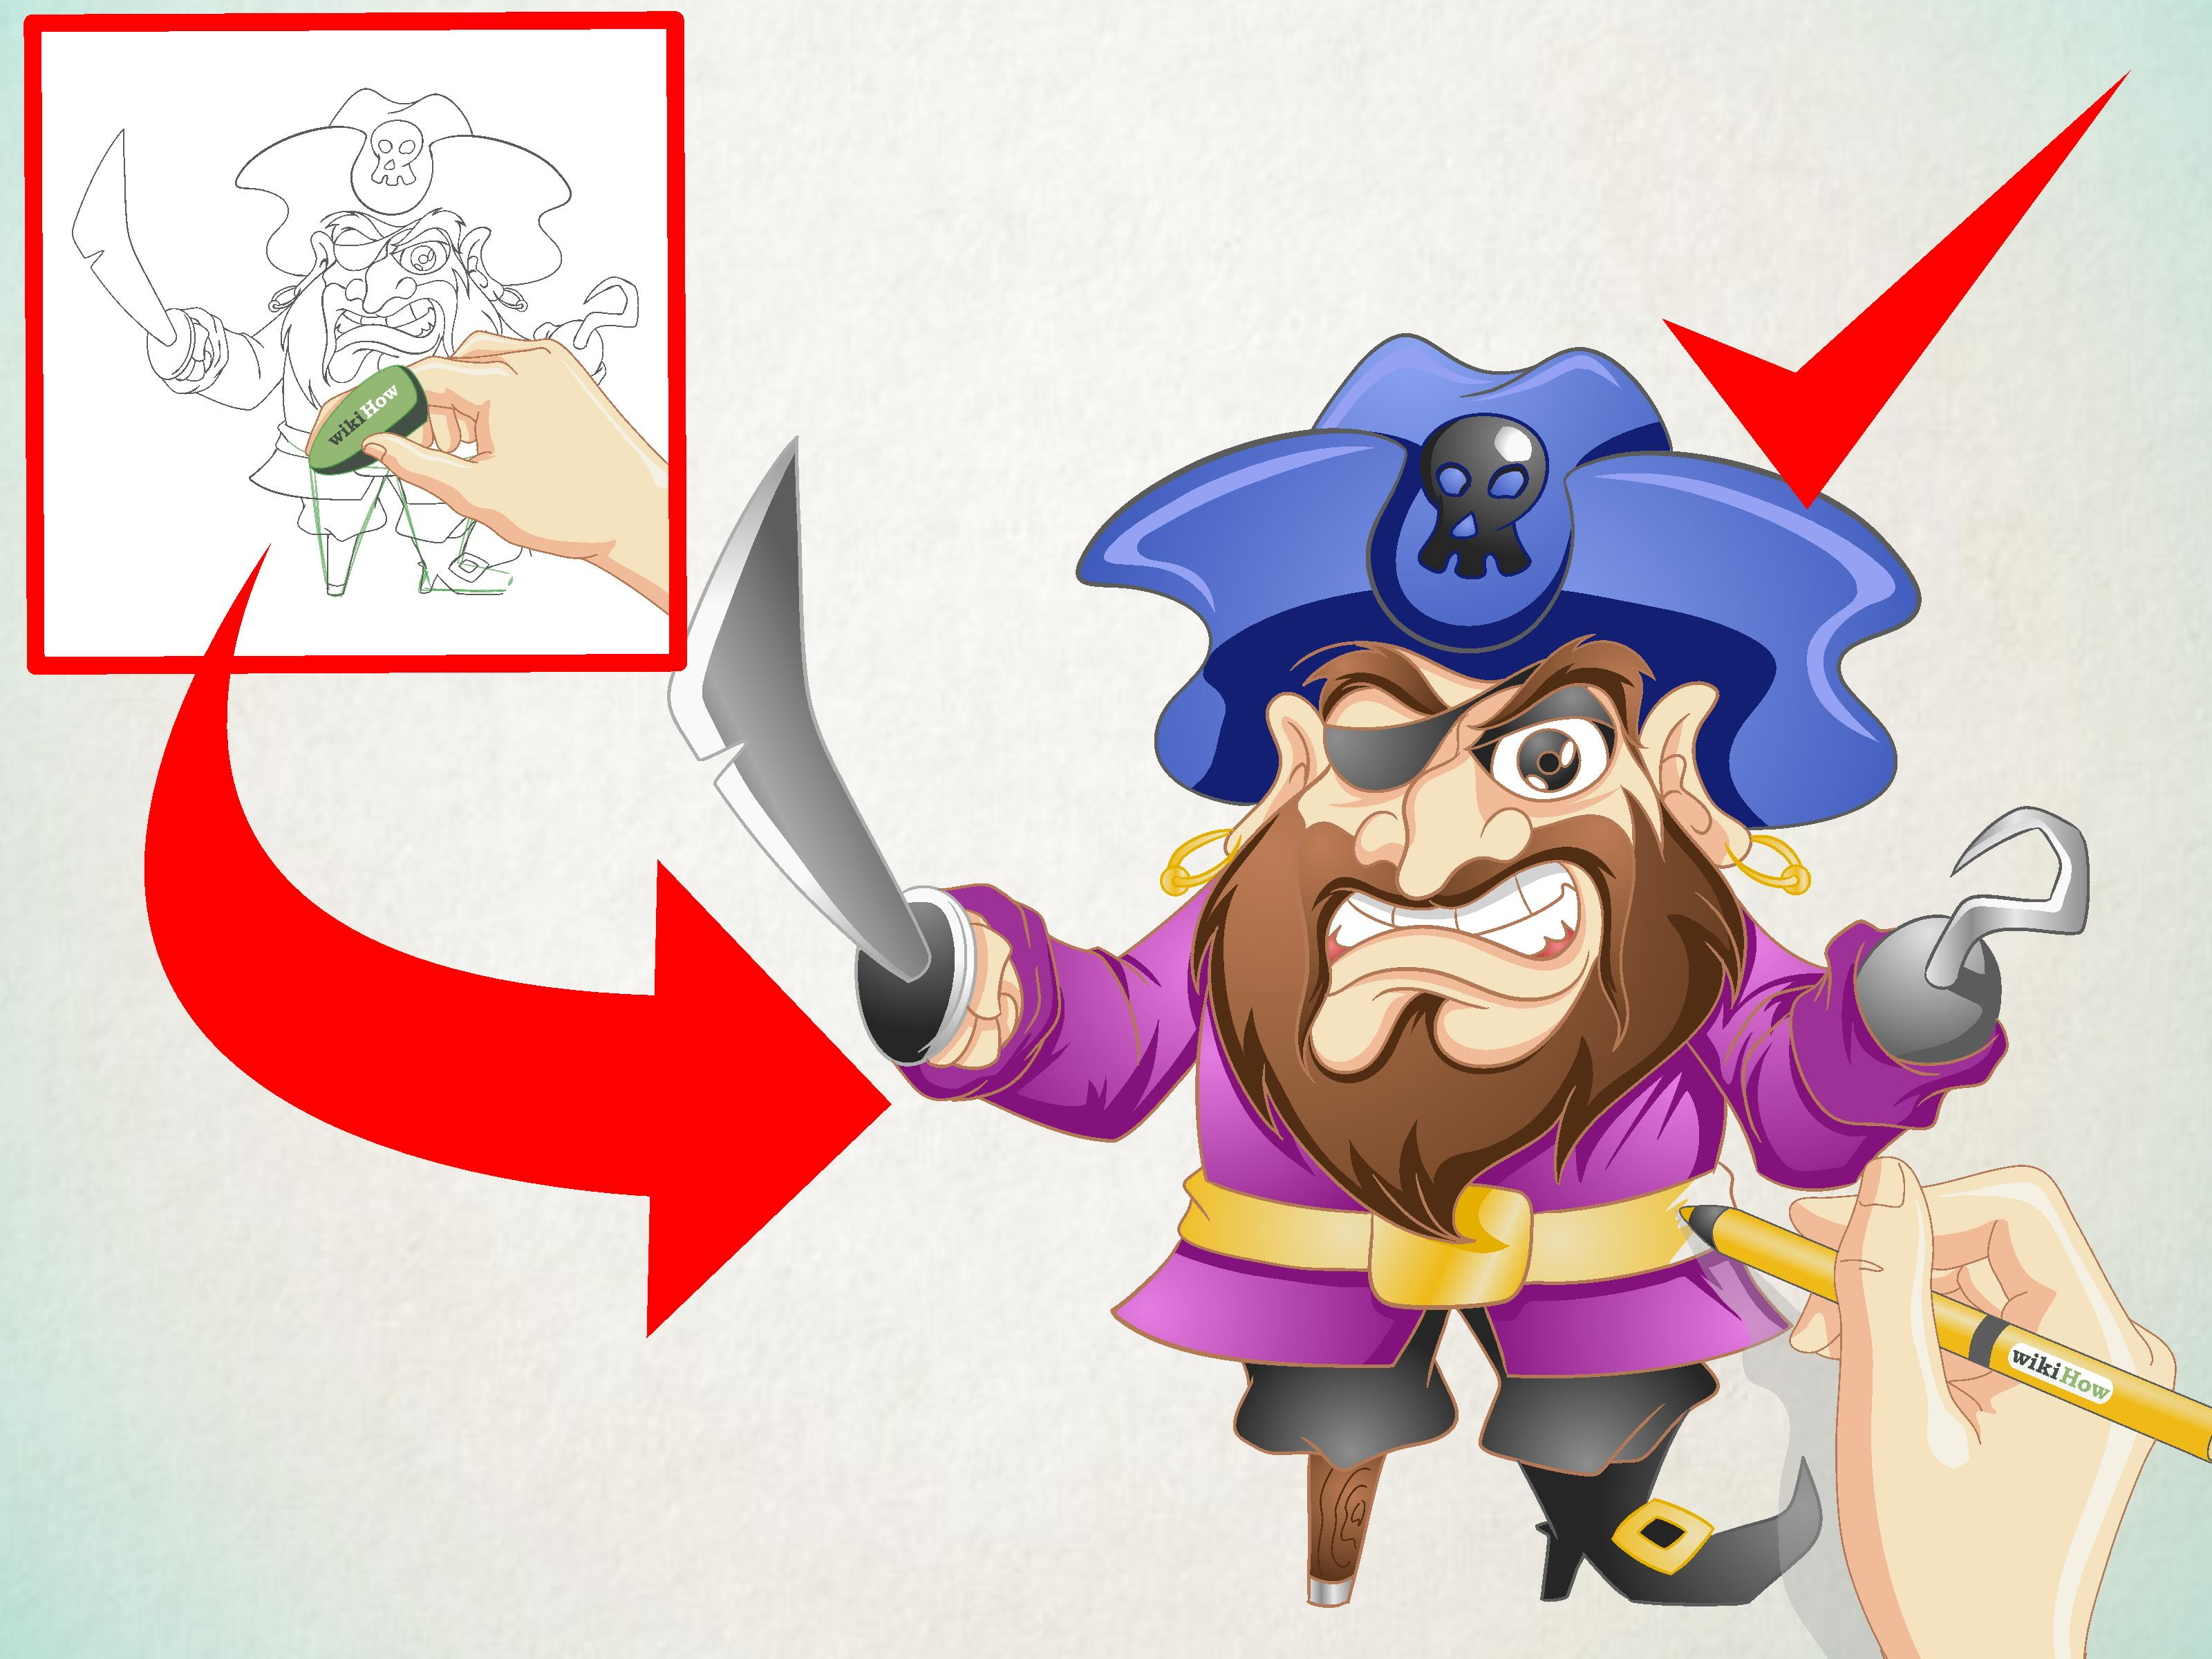 Drawn caricature pirate Pirate wikiHow to Cartoon Comics